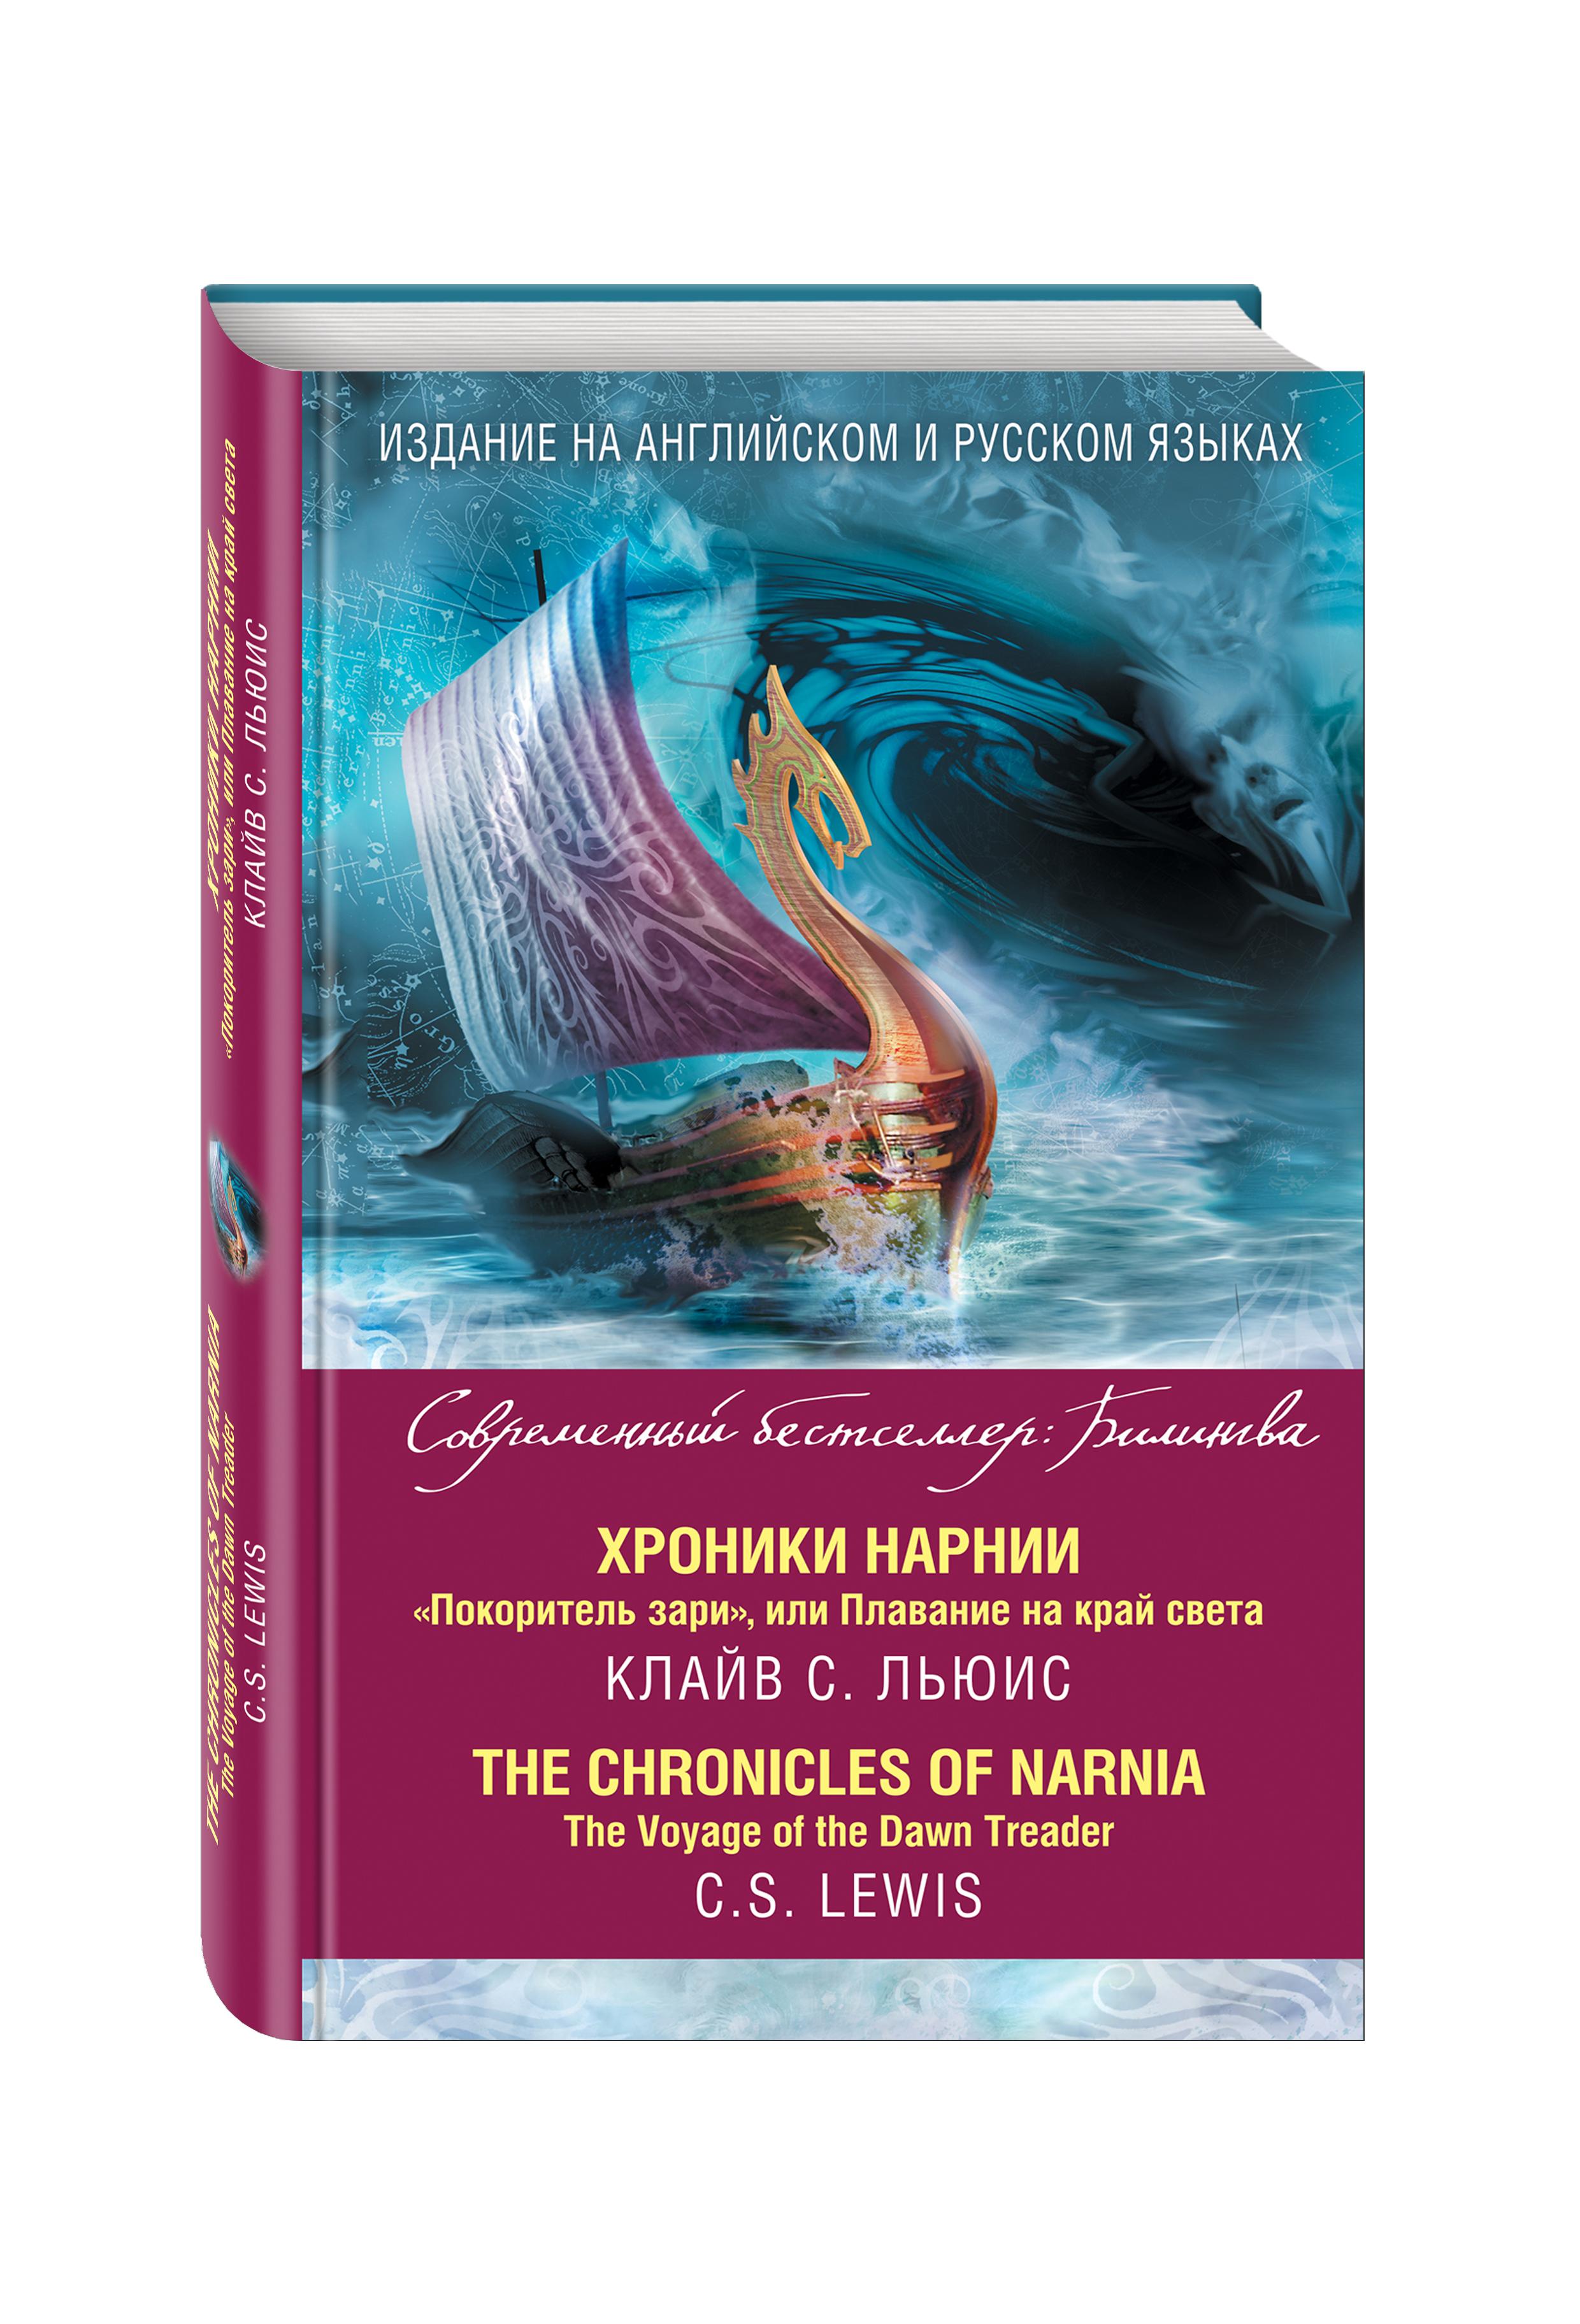 chronicles of narnia the the voyage of the dawn treader Льюис К. Хроники Нарнии. Покоритель зари, или Плавание на край света = The Chronicles of Narnia. The Voyage of the Dawn Treader